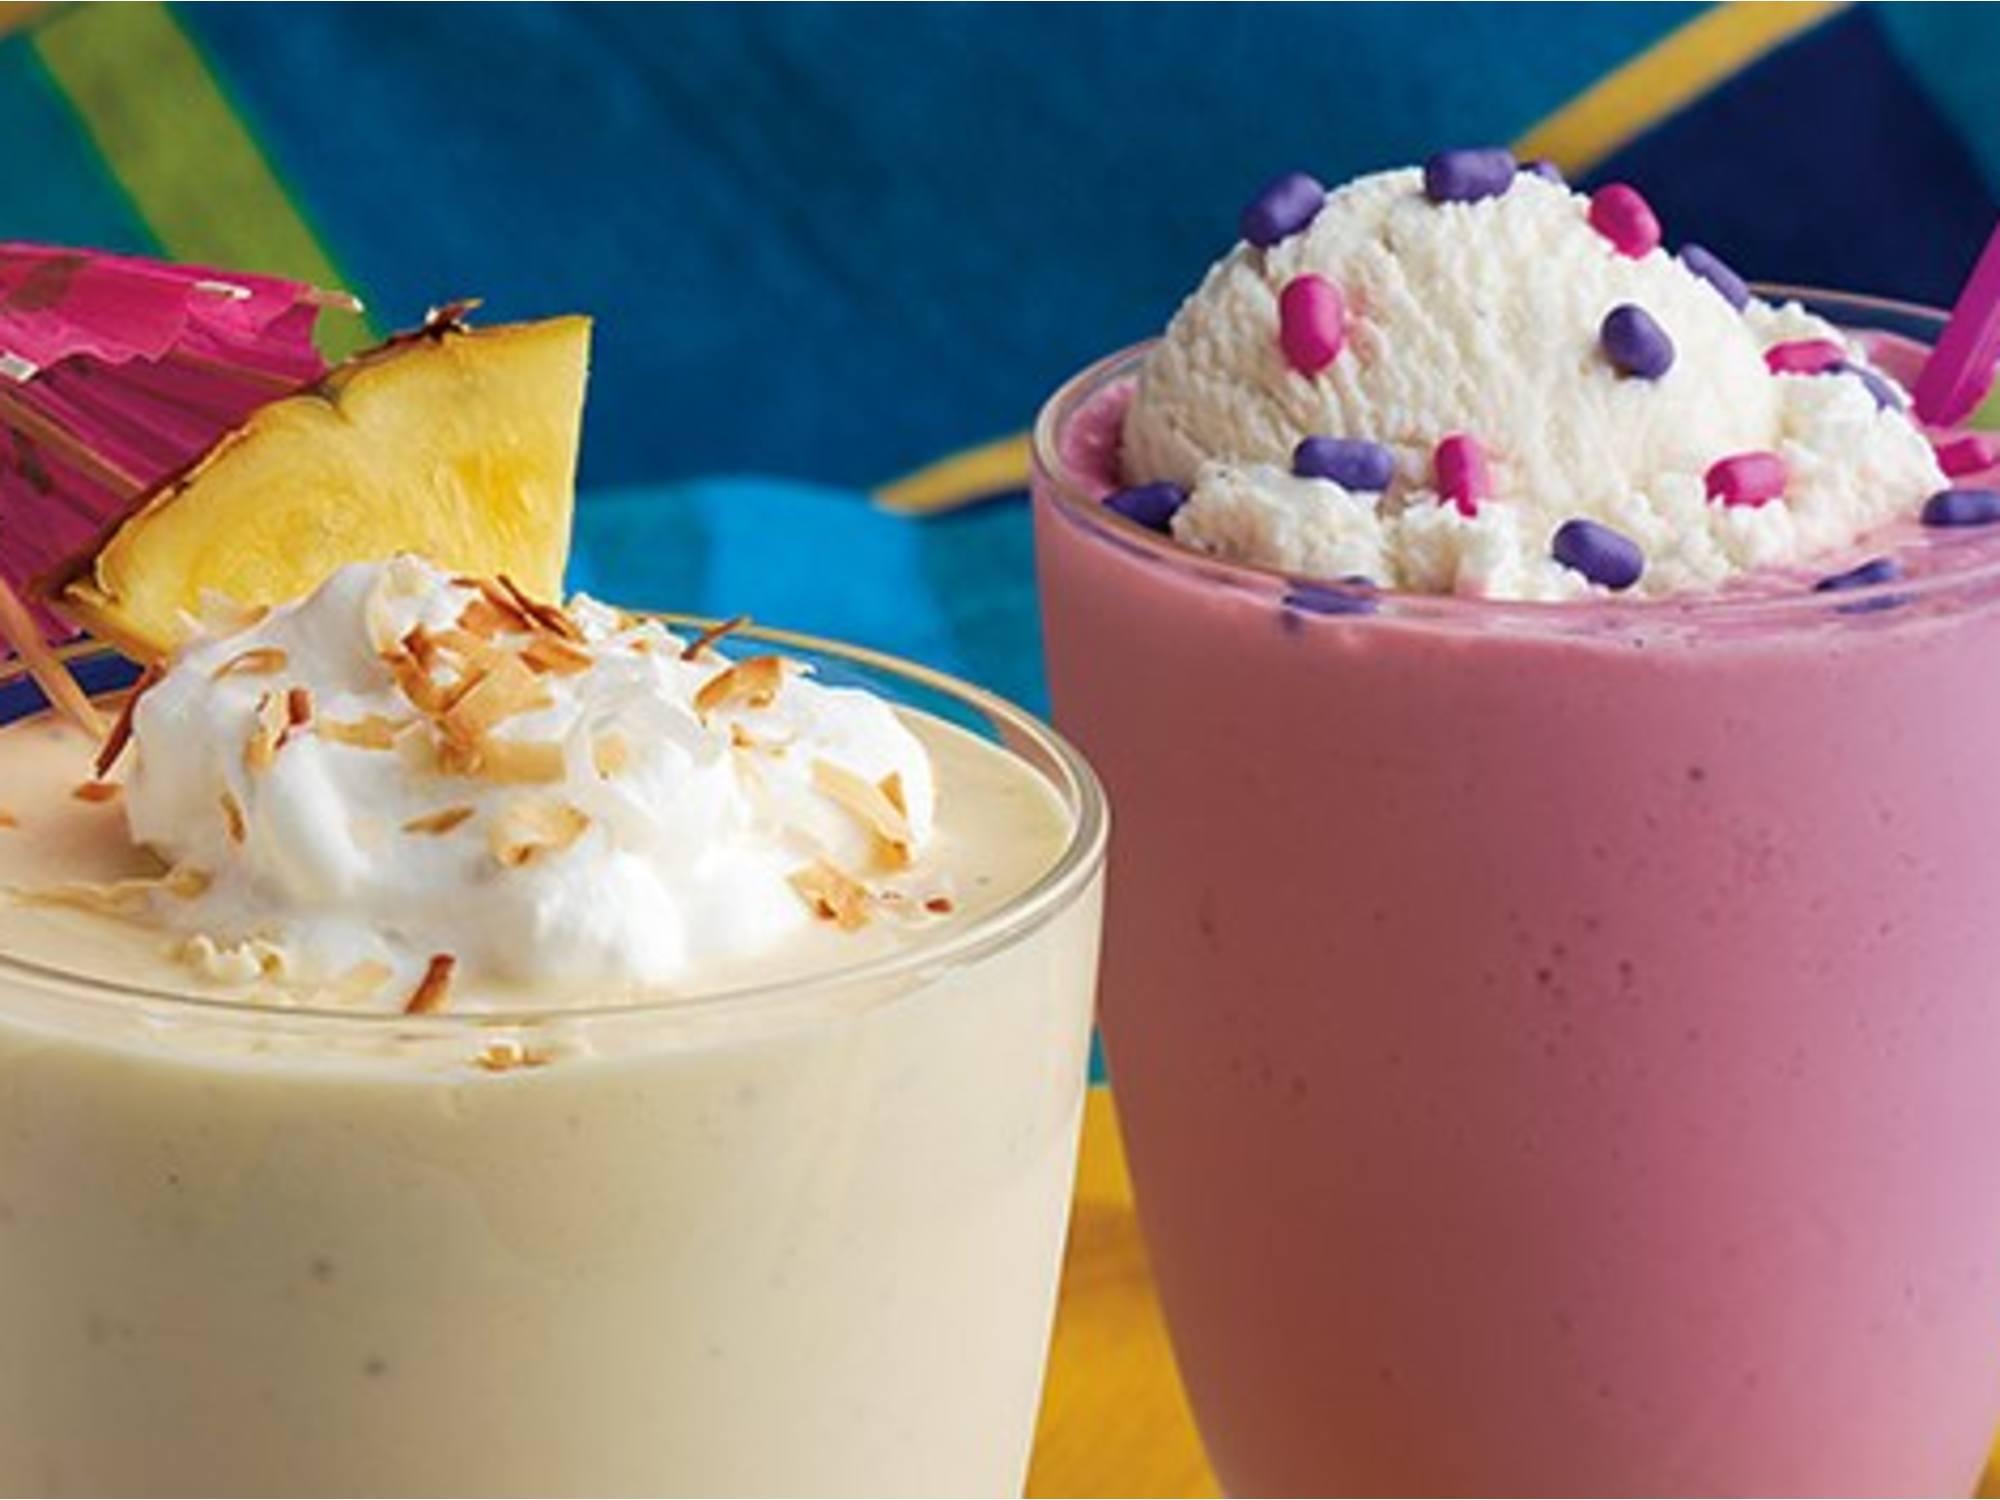 Wacky Waikiki Shakes